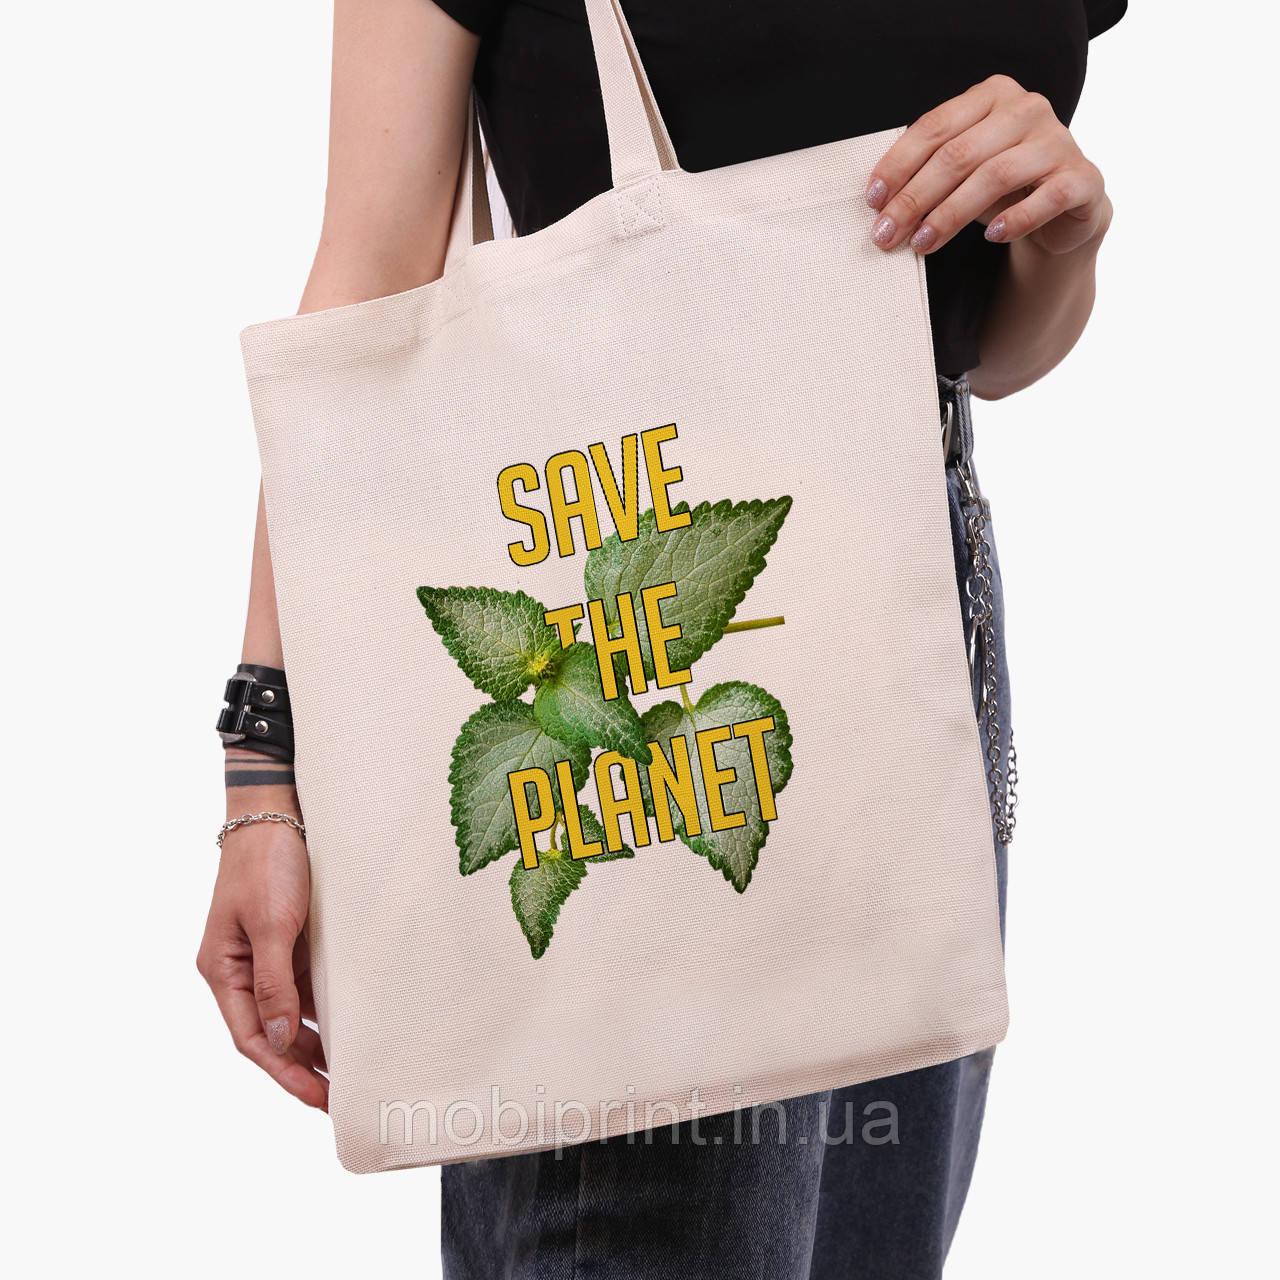 Эко сумка шоппер Экология (Ecology) (9227-1336)  экосумка шопер 41*35 см